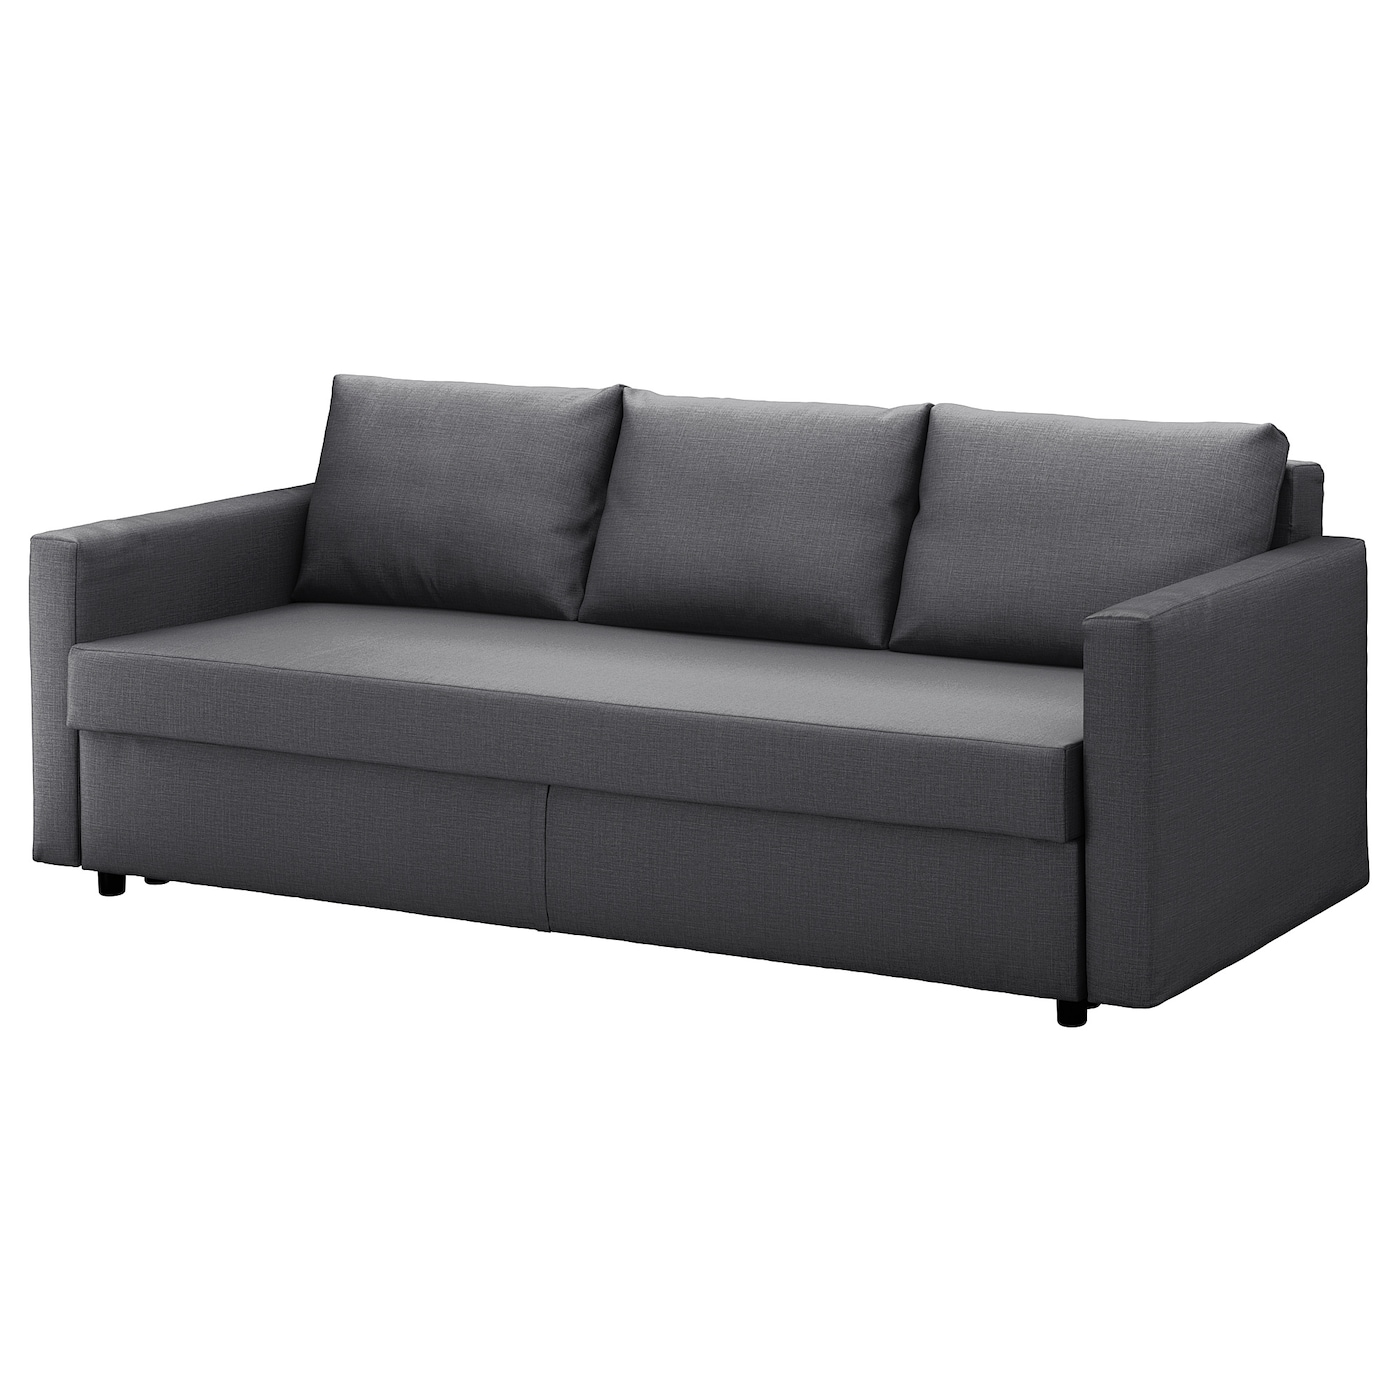 FRIHETEN Sofá cama 3 plazas Skiftebo gris oscuro